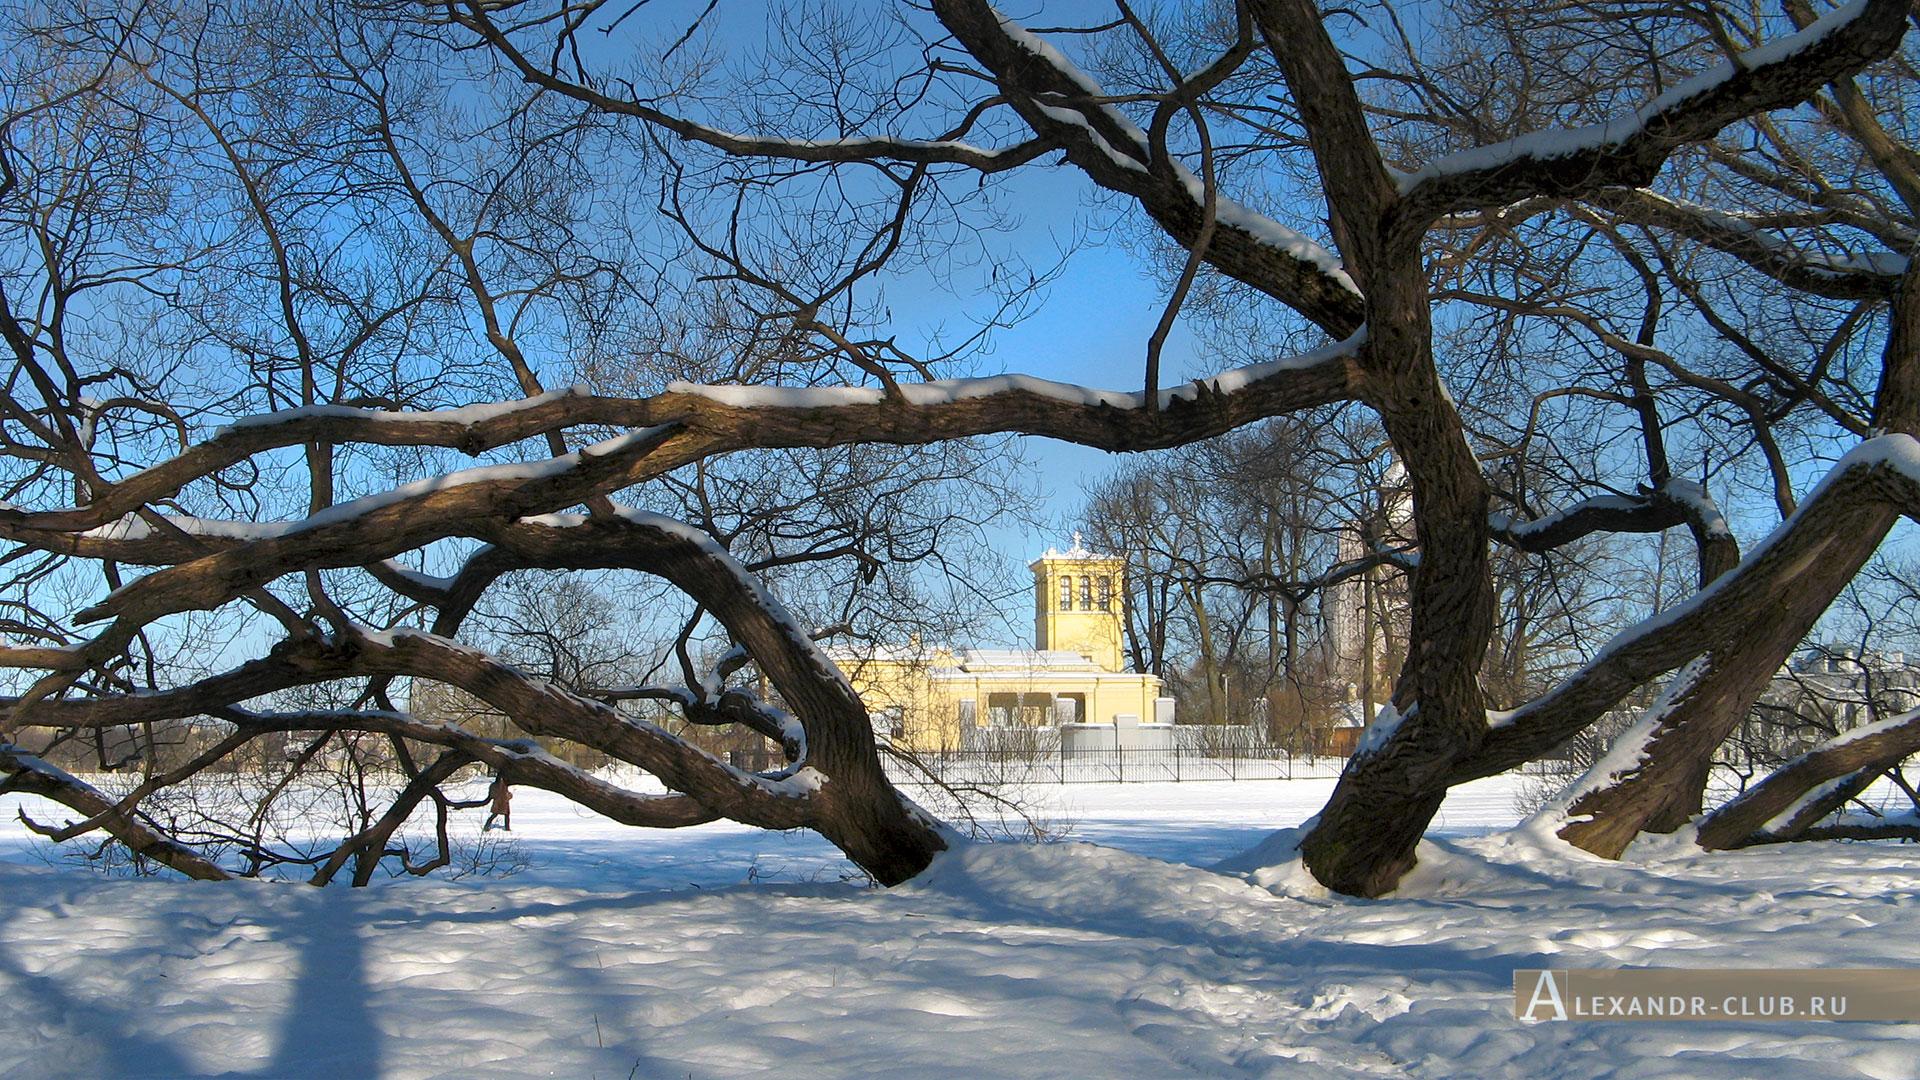 Петергоф, Колонистский парк, зима, Царицын павильон – 4